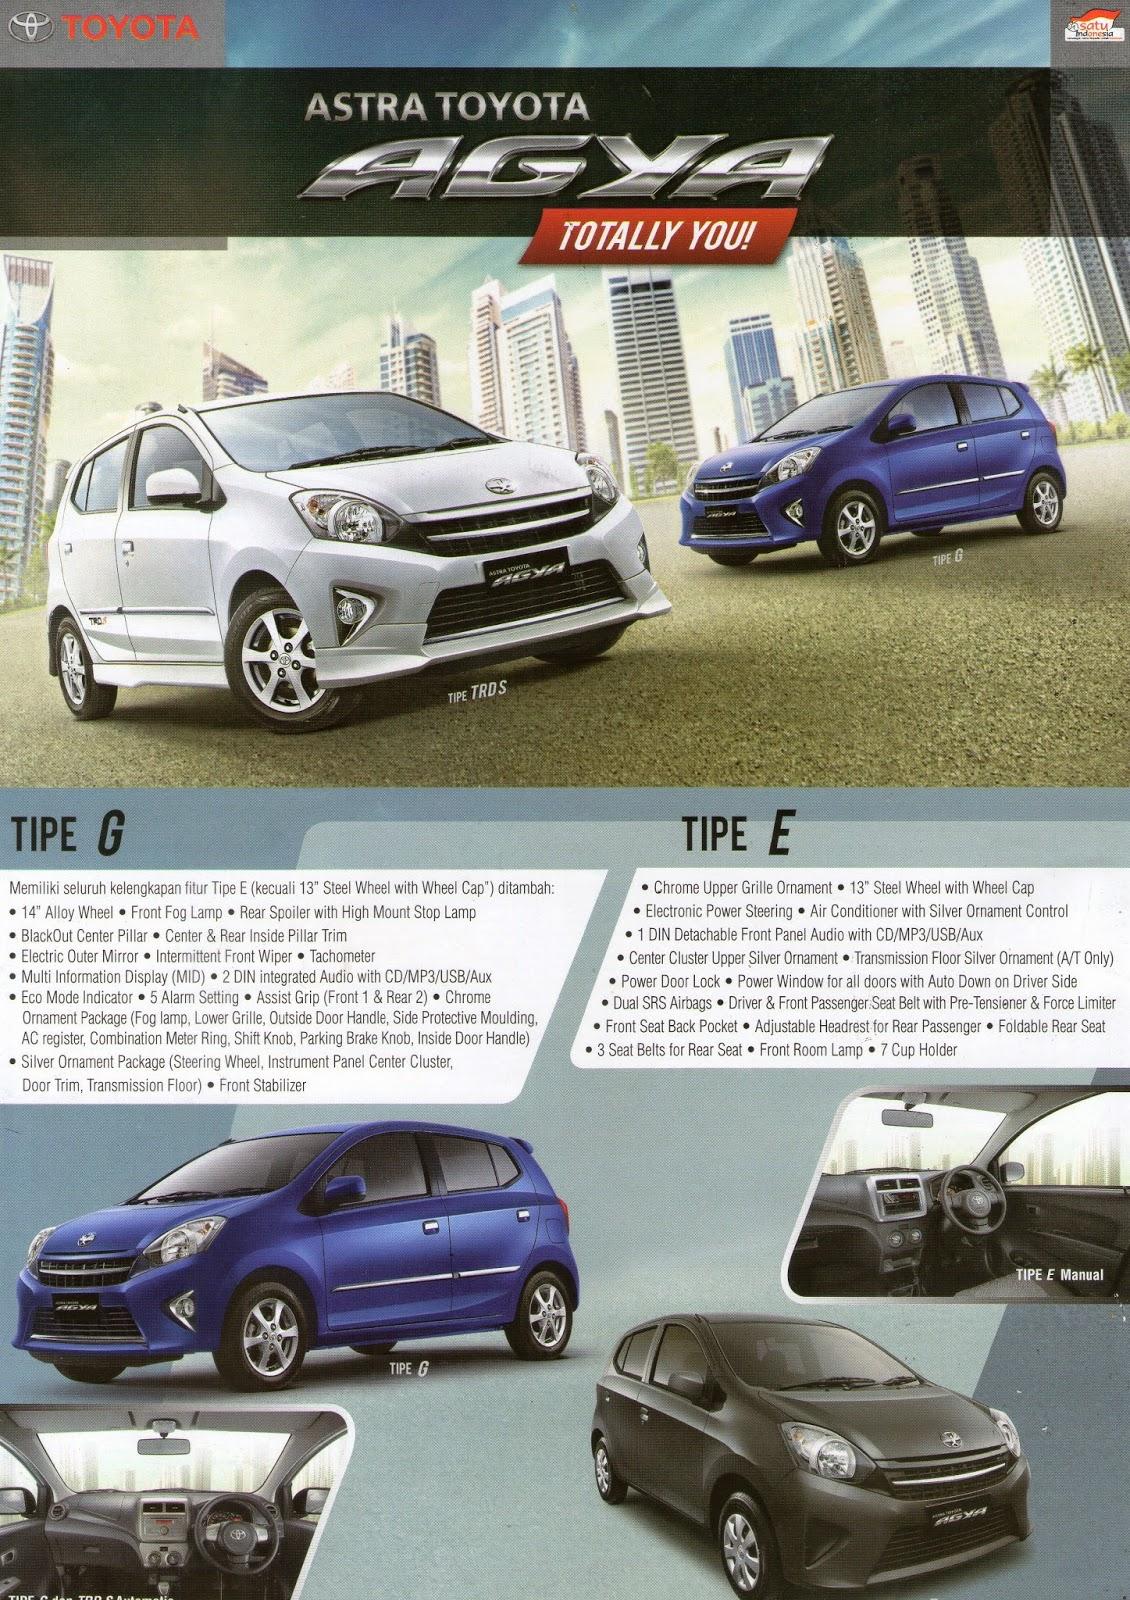 Harga New Agya Trd Grand Veloz 2016 Pt Wira Megah Profitamas I Toyota